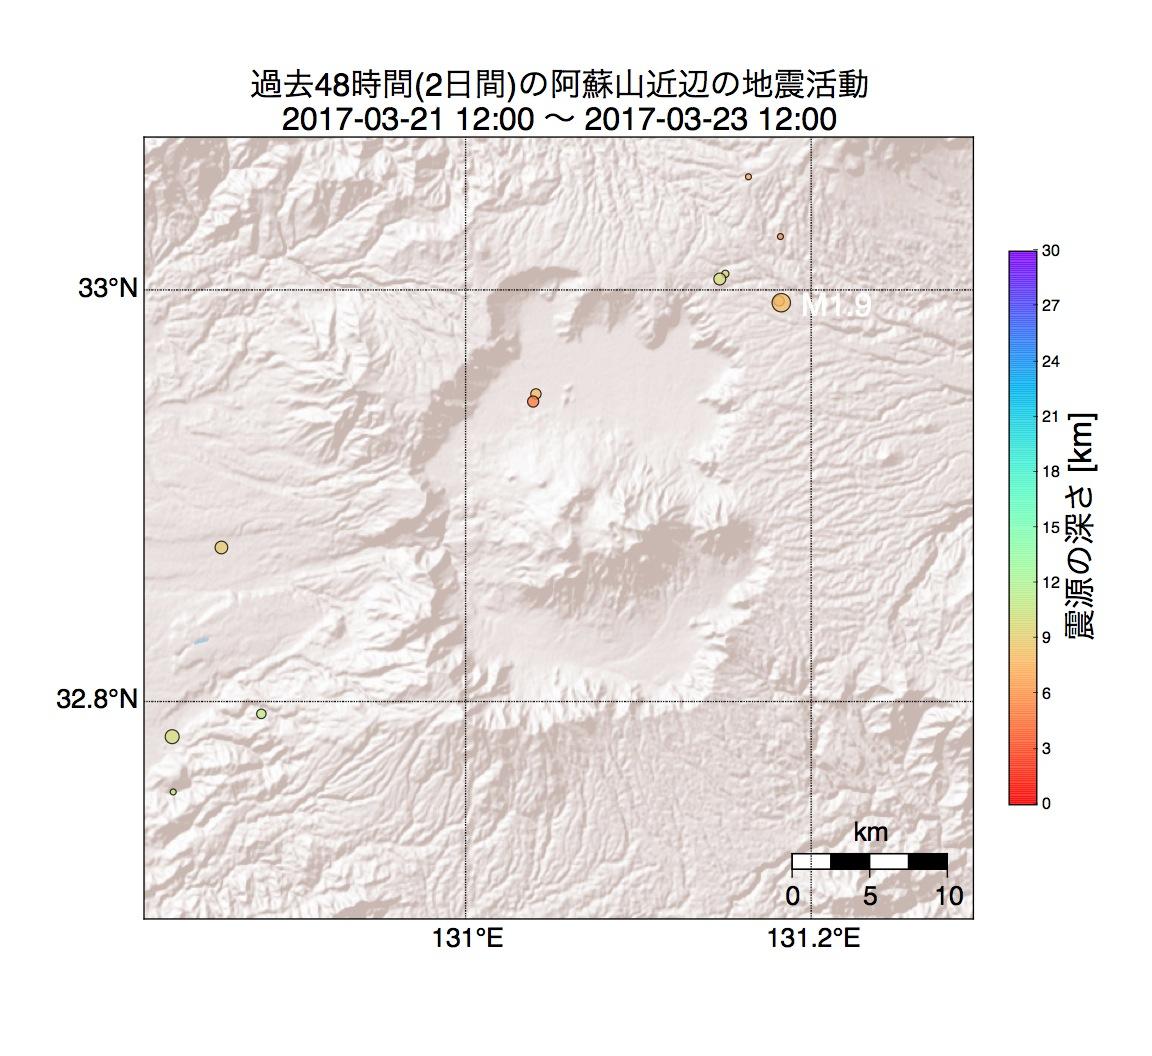 http://jishin.chamu.org/aso/20170323_1.jpg